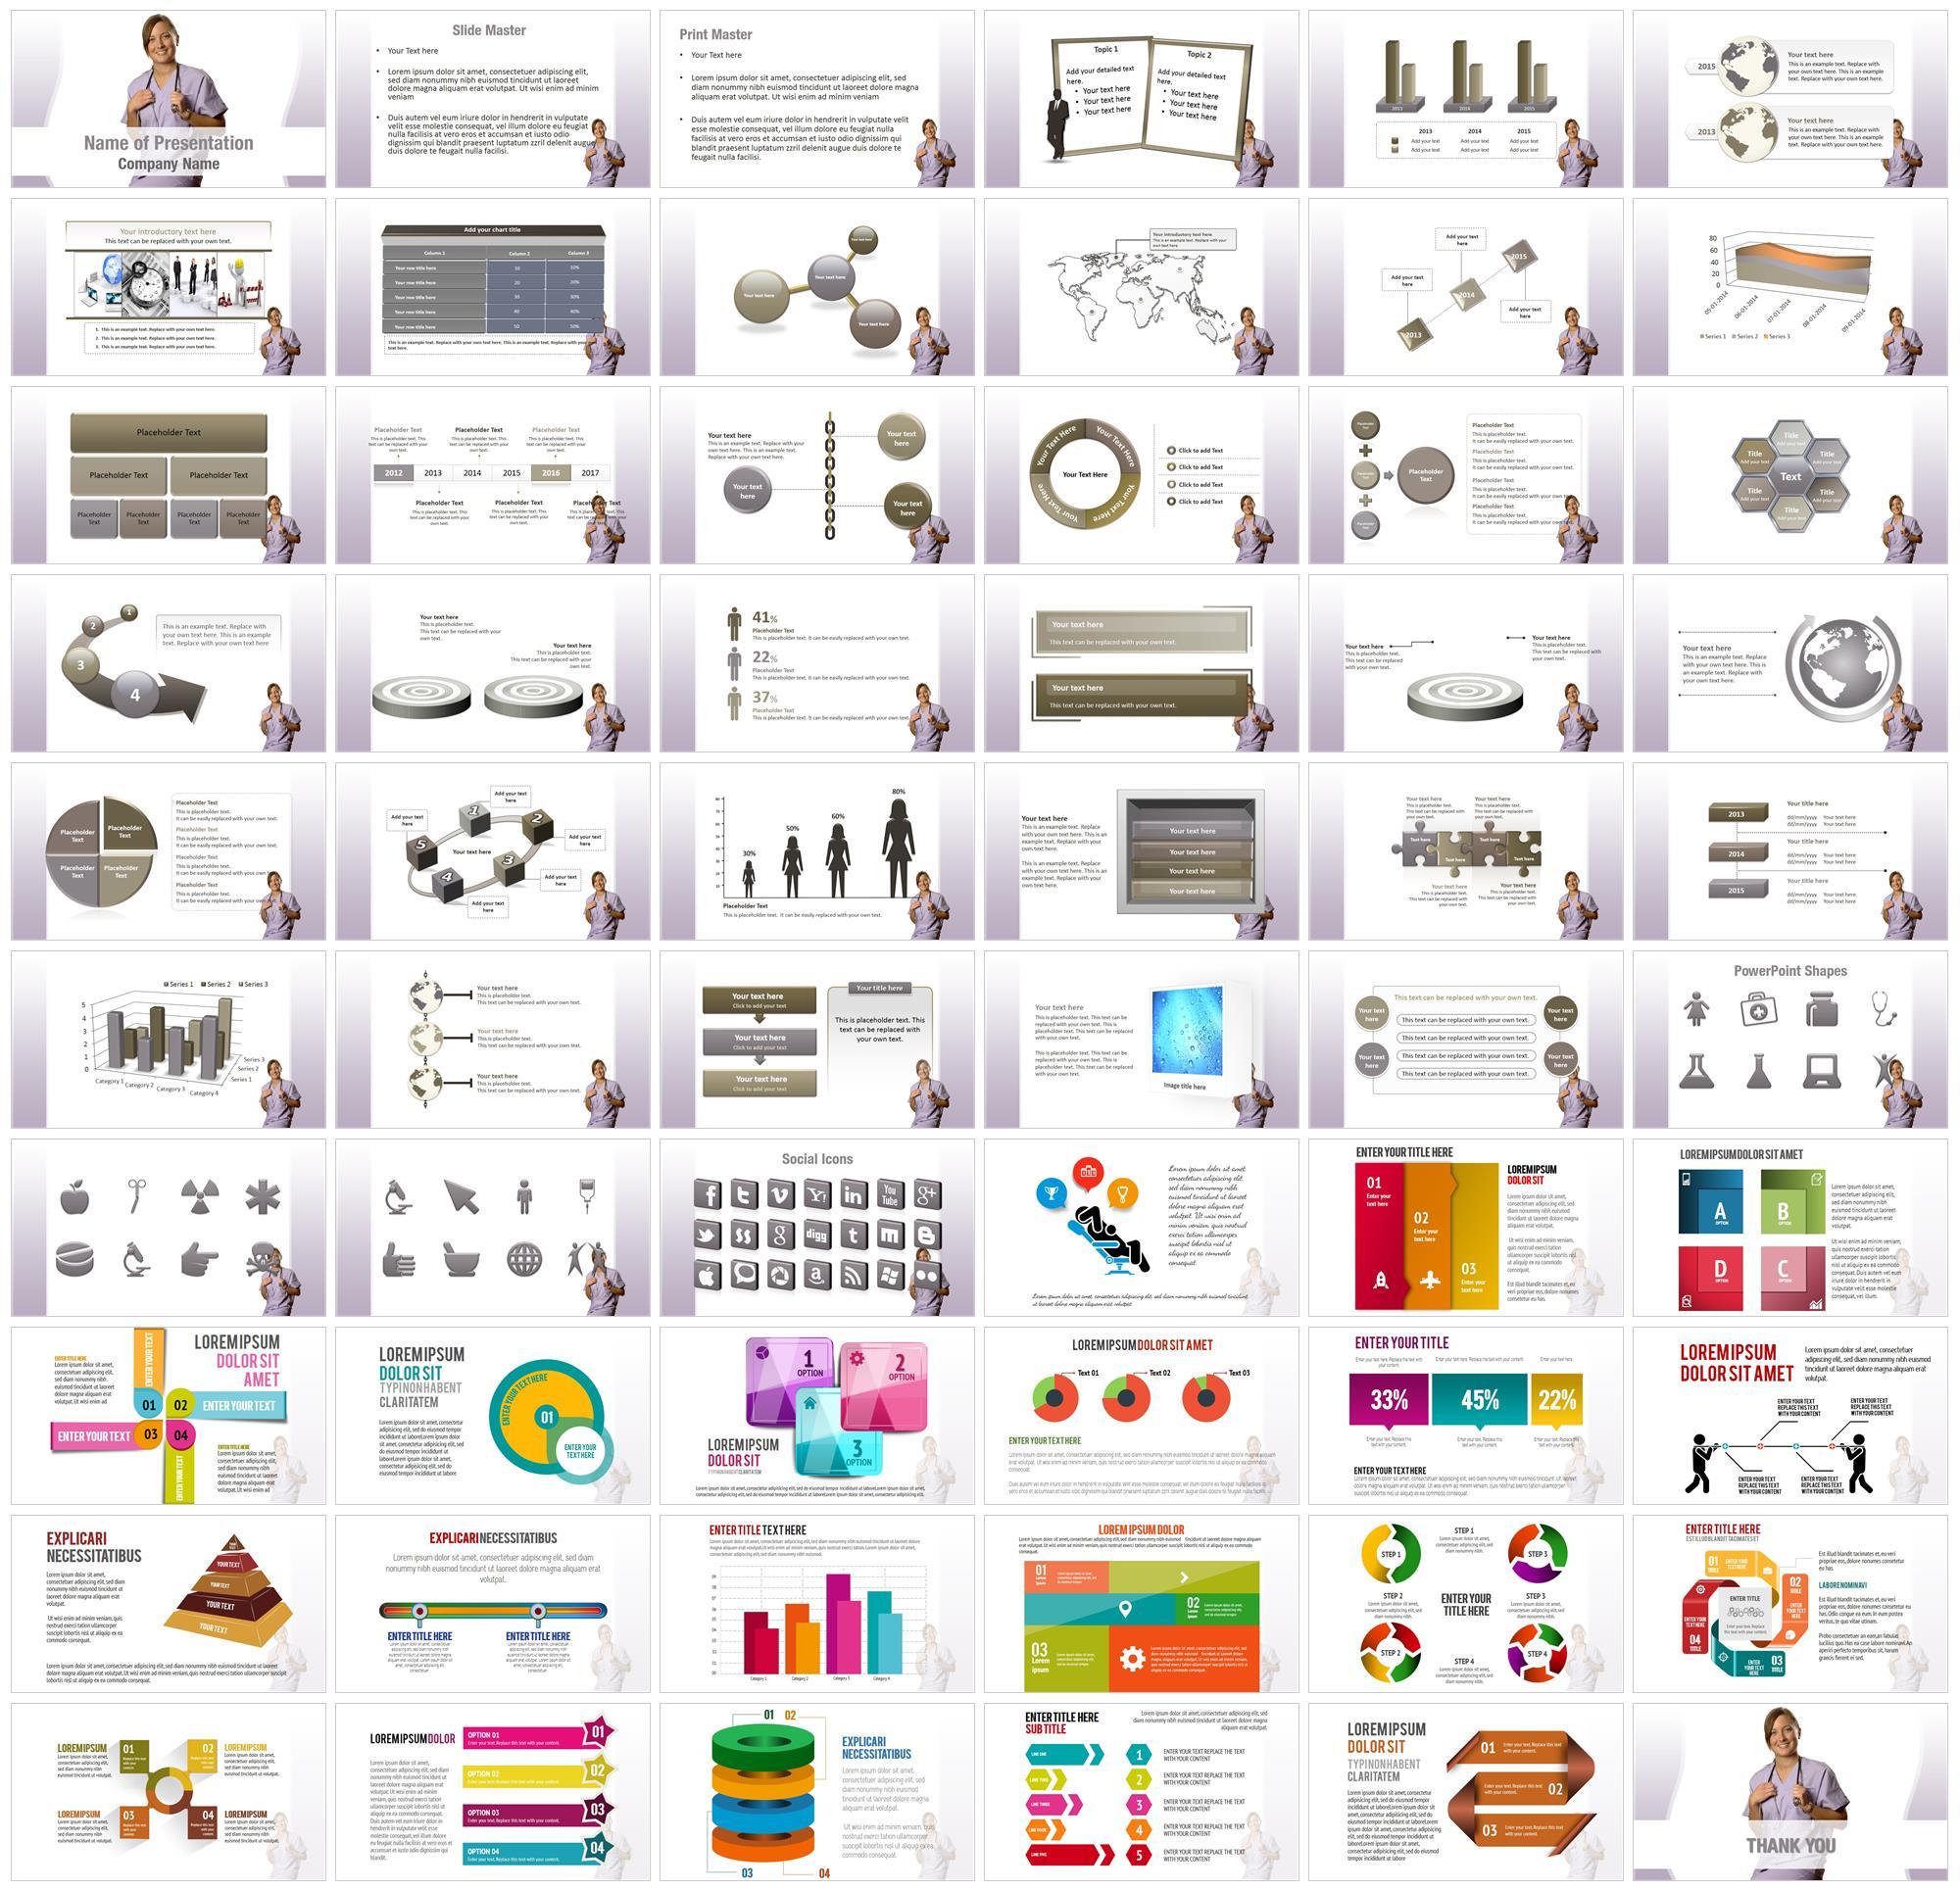 Nurse PowerPoint Templates Nurse PowerPoint Backgrounds Templates for PowerPoint